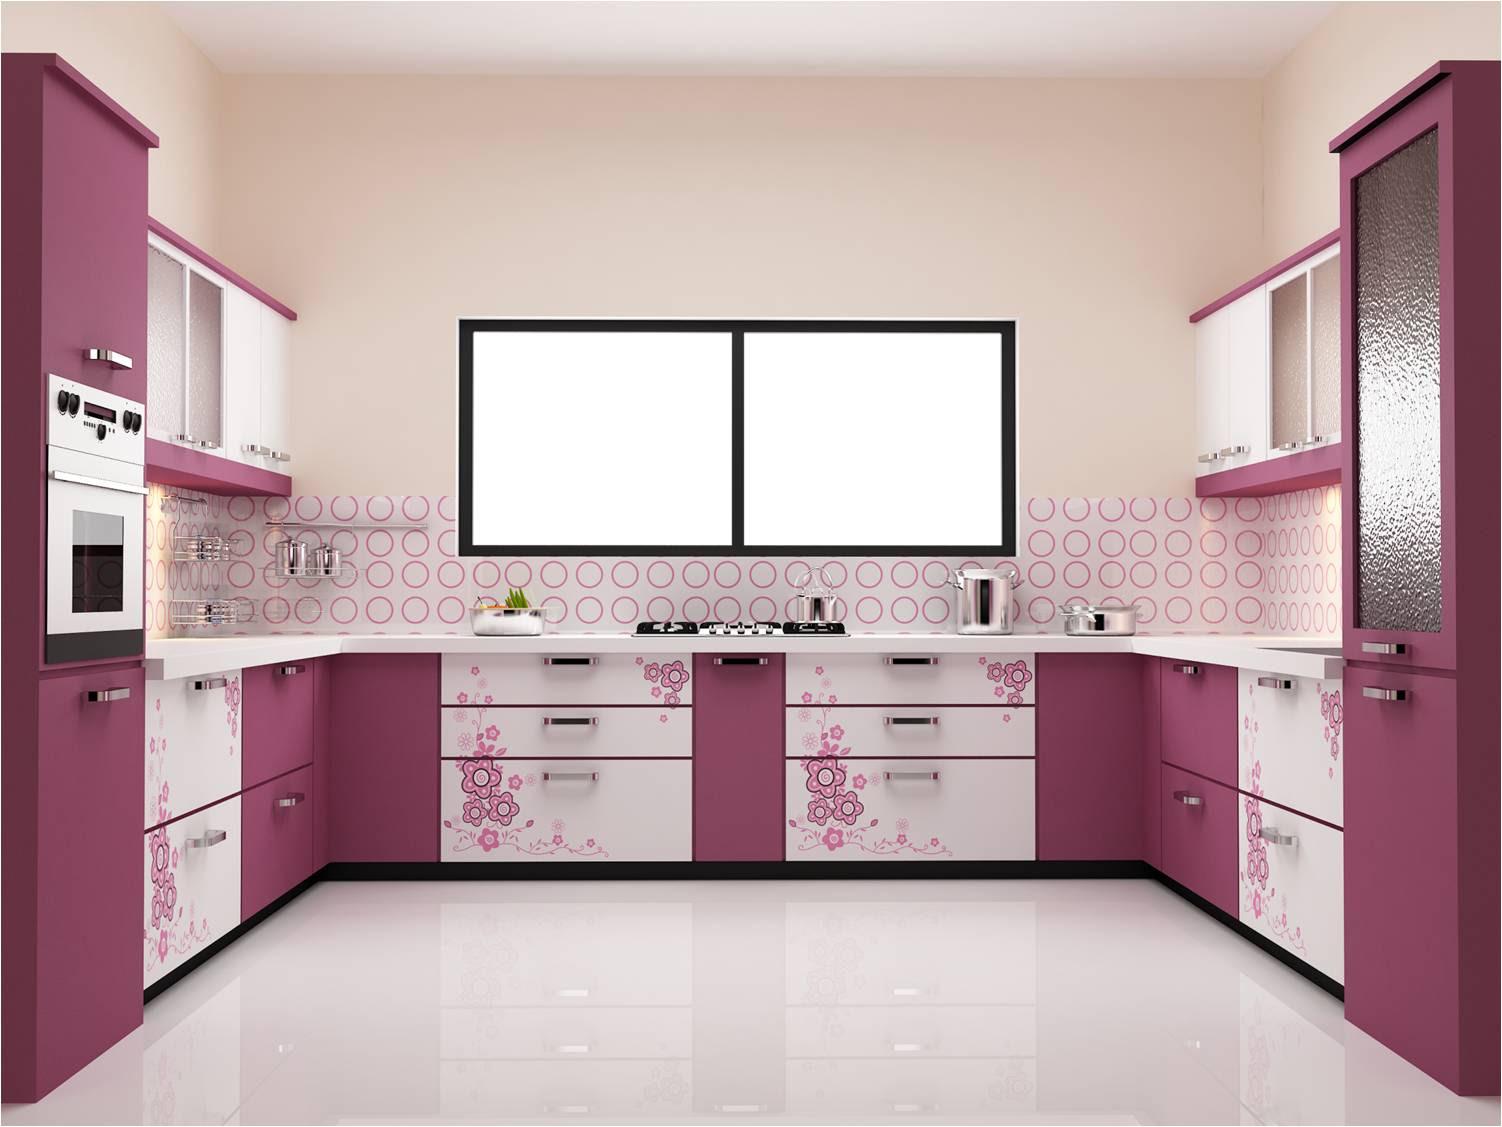 Modular Kitchen-the new concept – Interior Designing Ideas